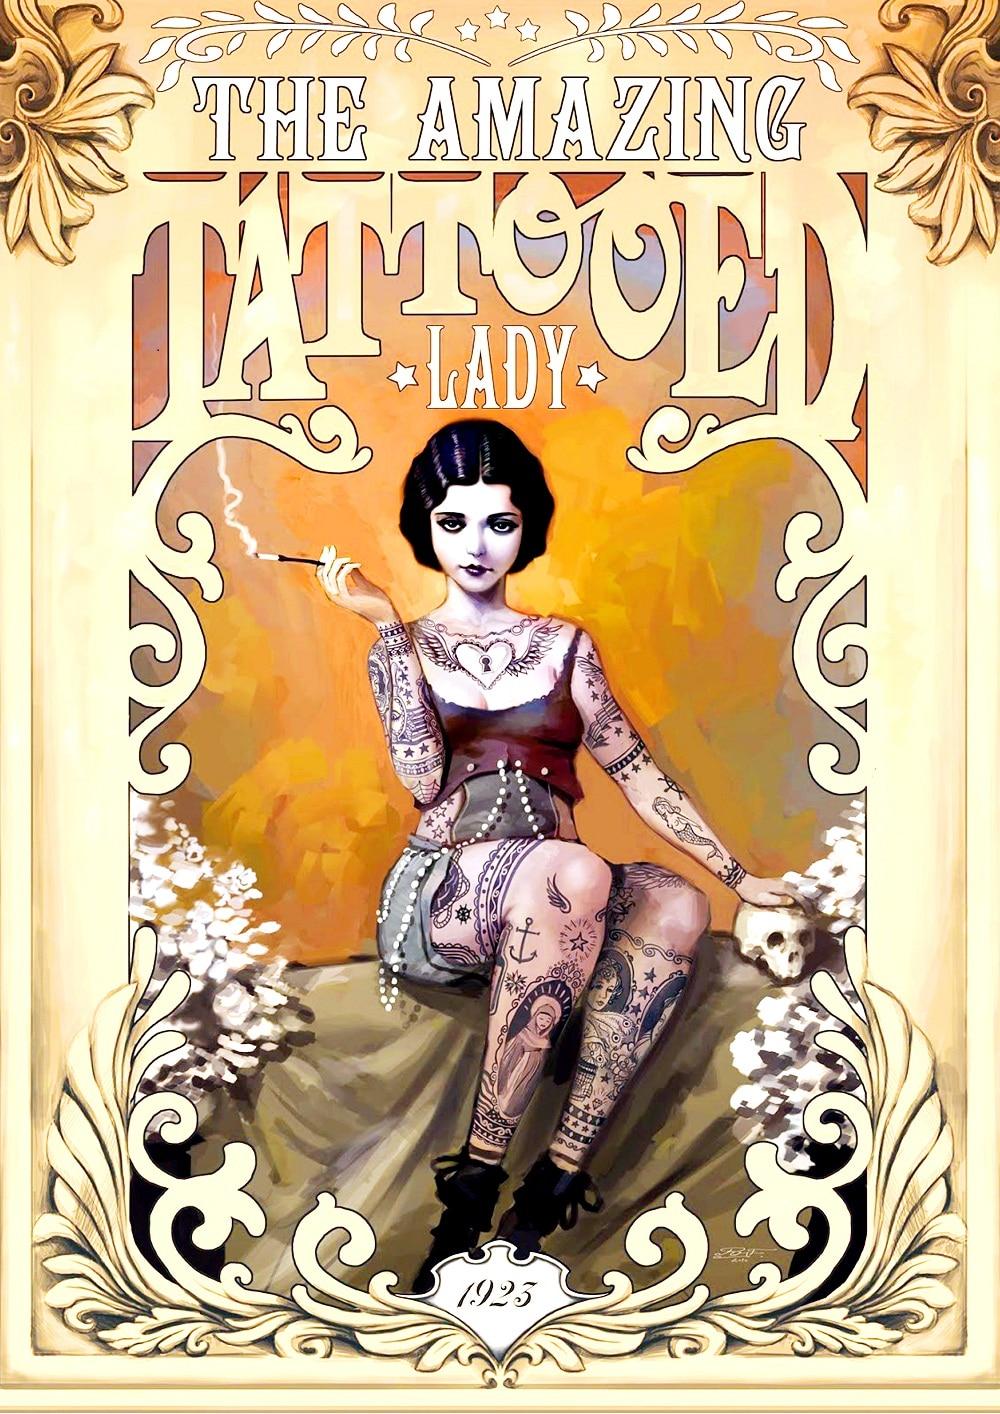 Aliexpress.com : Buy THE AMAZING TATTOOED Beauty Poster ...